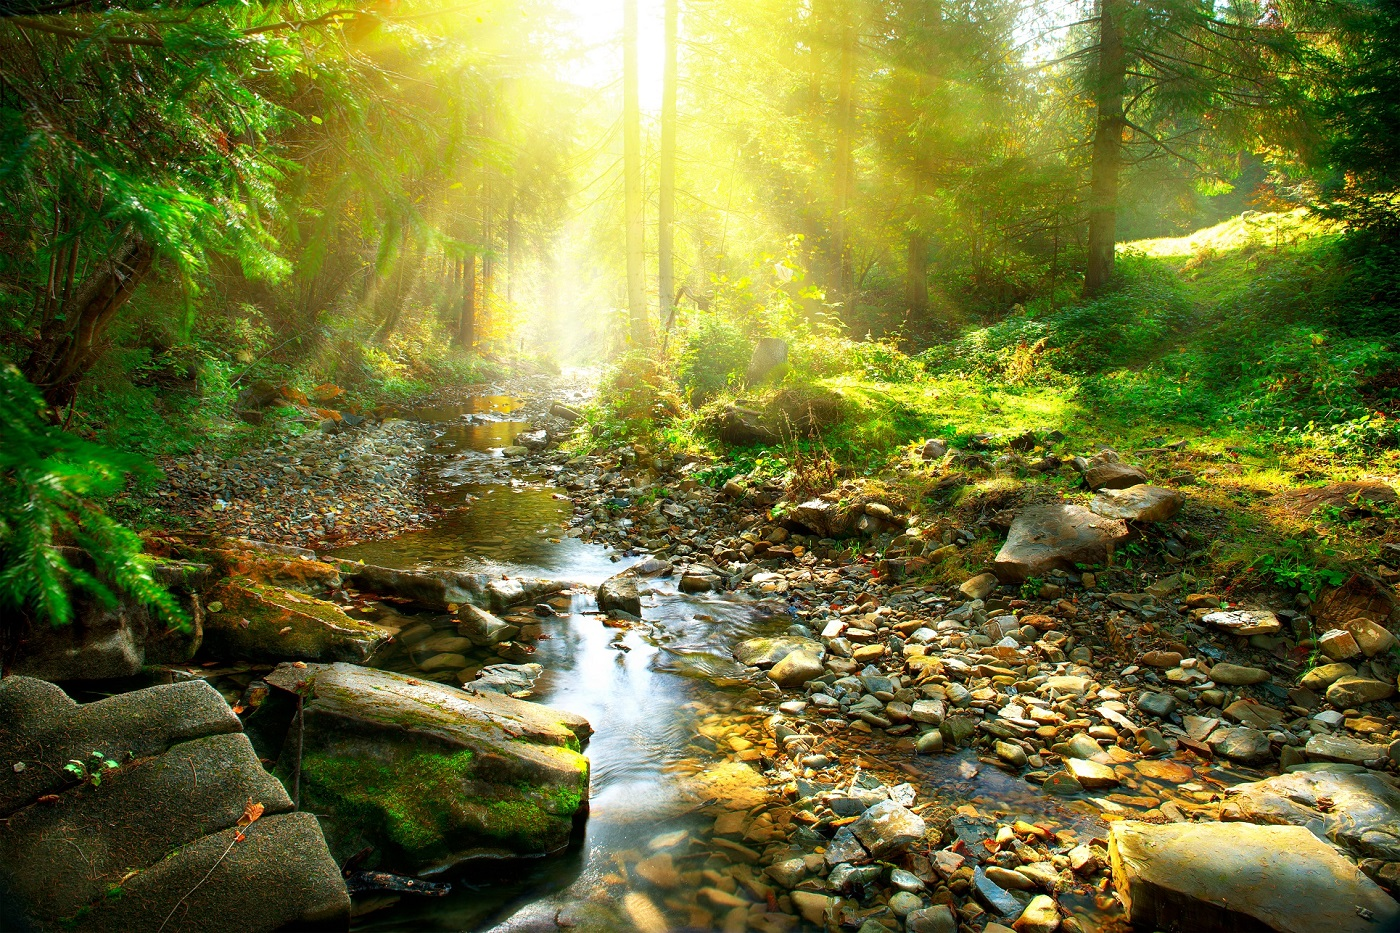 Premium Bio Naturprodukte & Rohstoffe